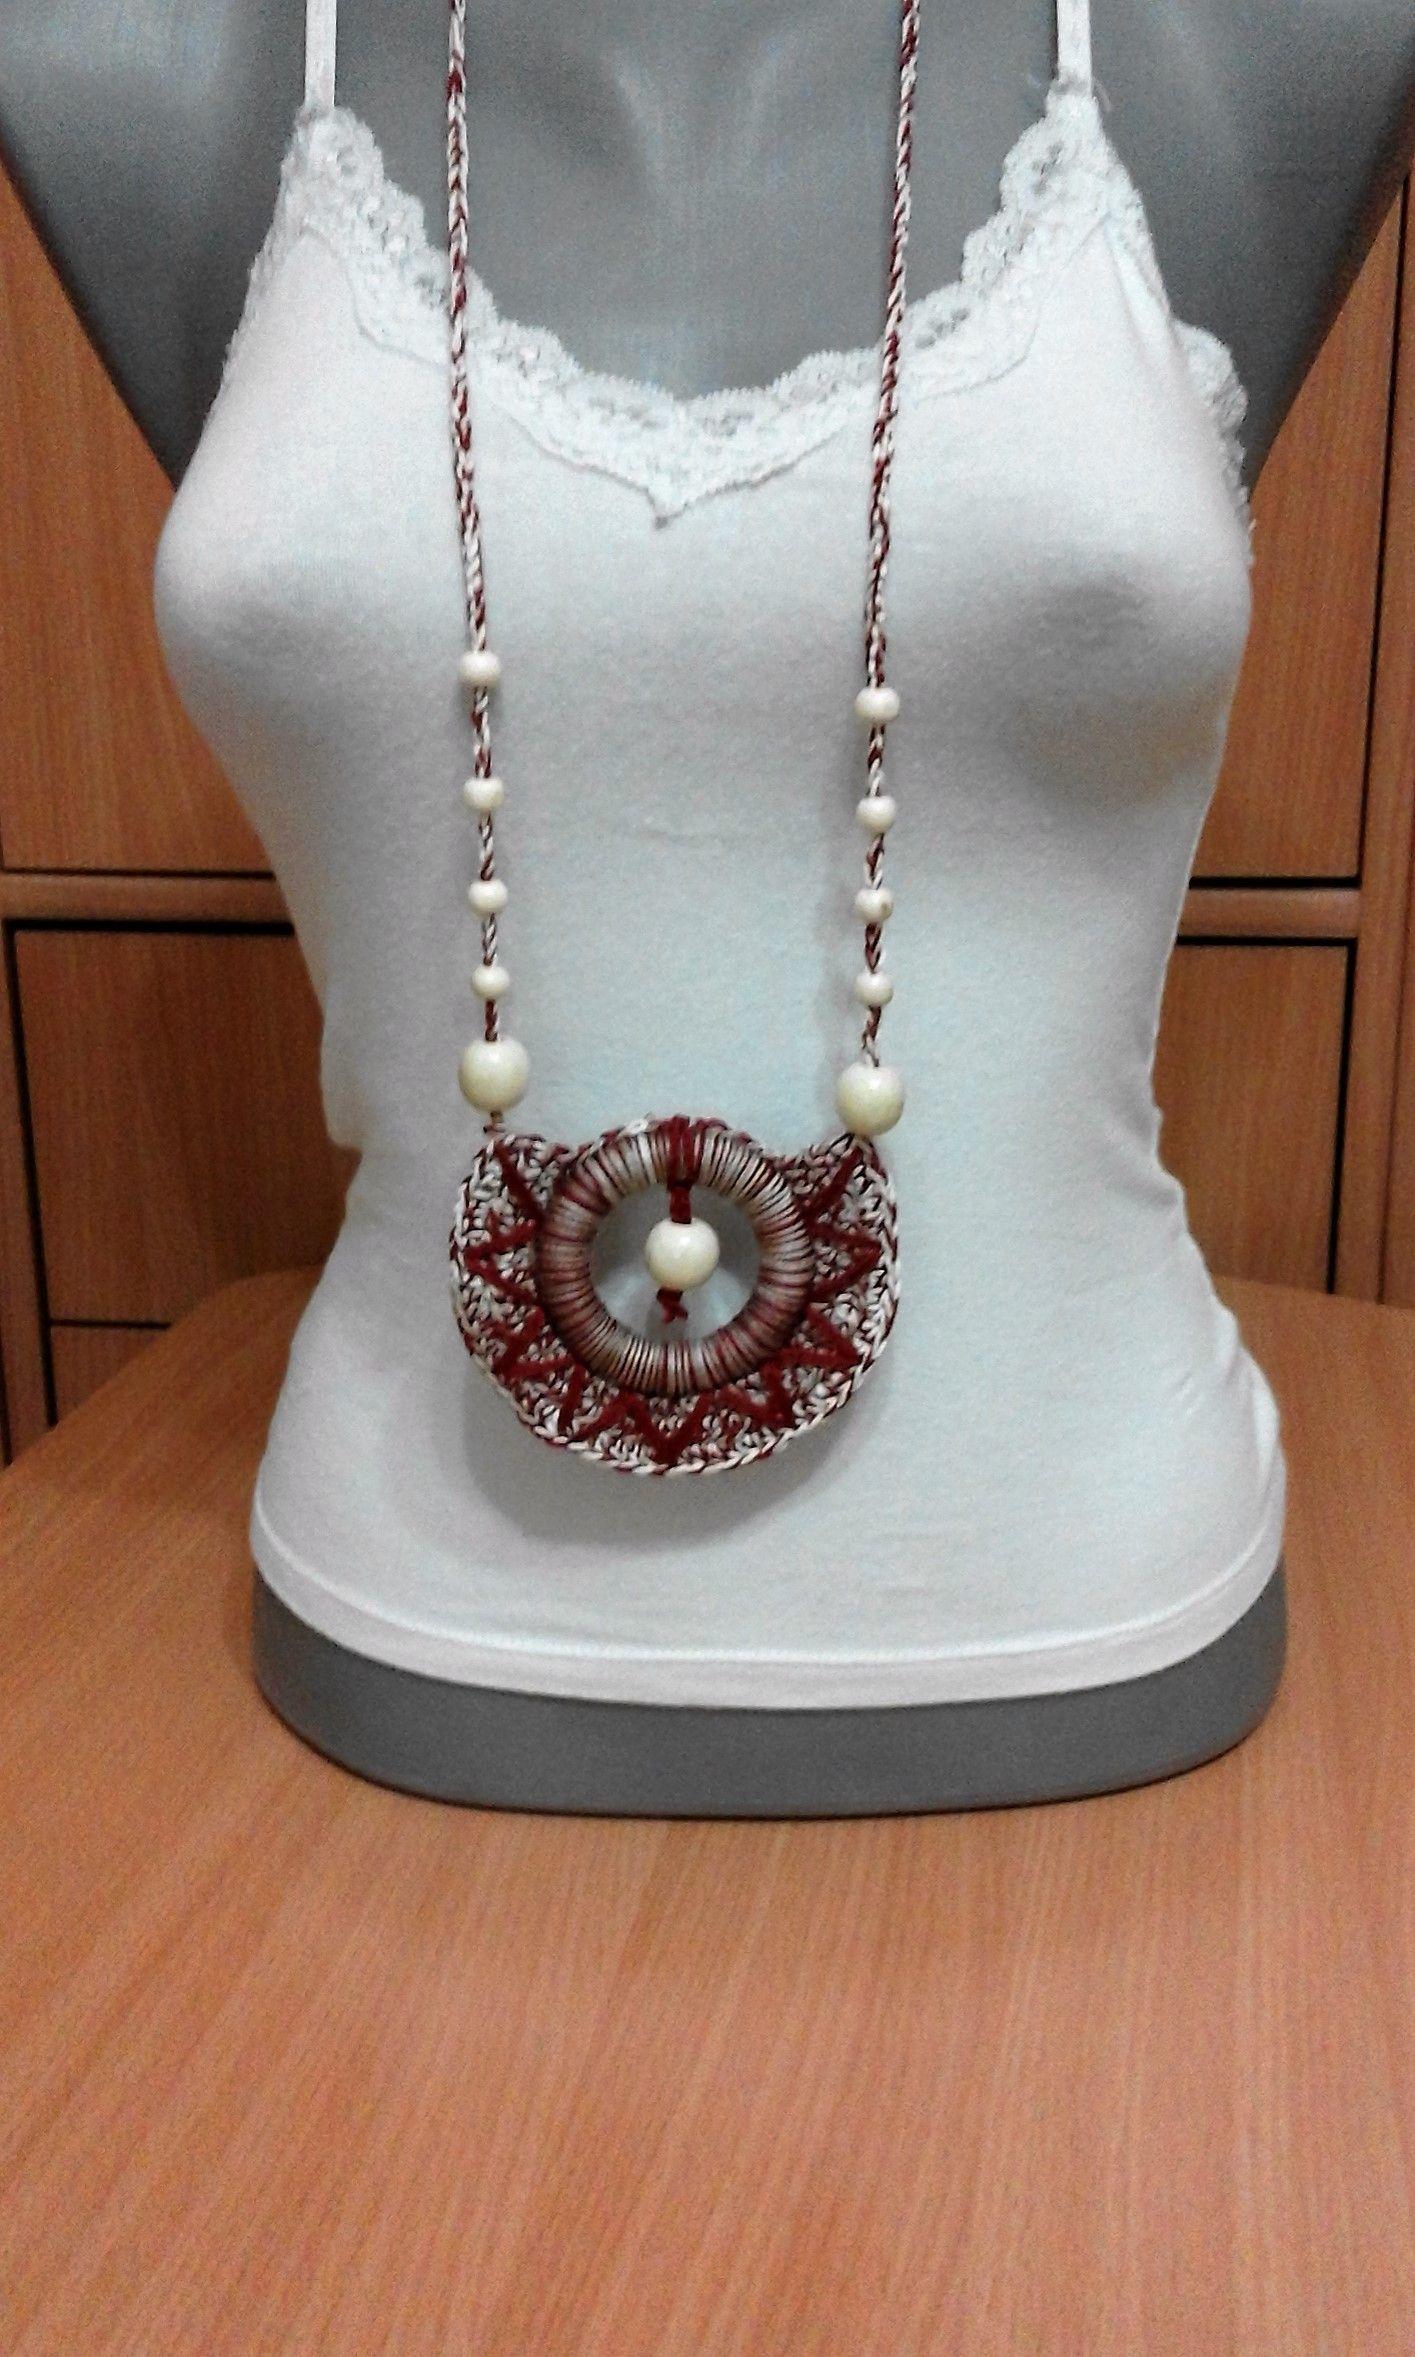 Crochet Necklace made by Lidija Farago | My Work | Pinterest